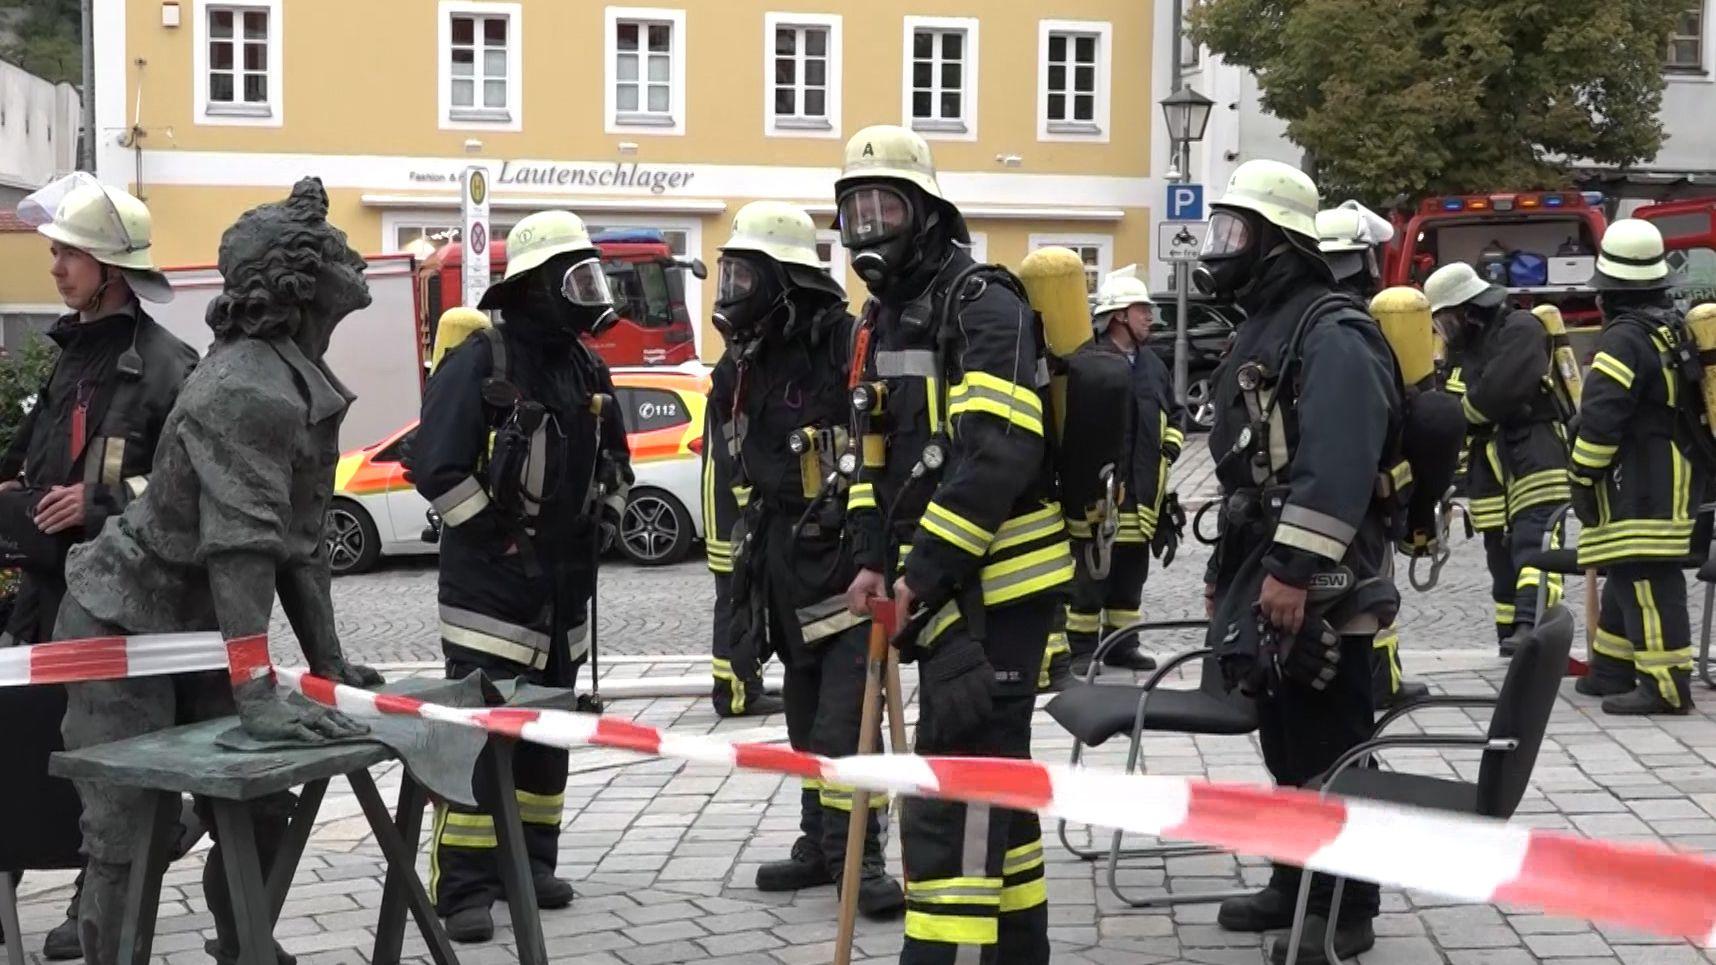 Feuerwehrleute in der Altstadt von Burglengenfeld, Landkreis Schwandorf